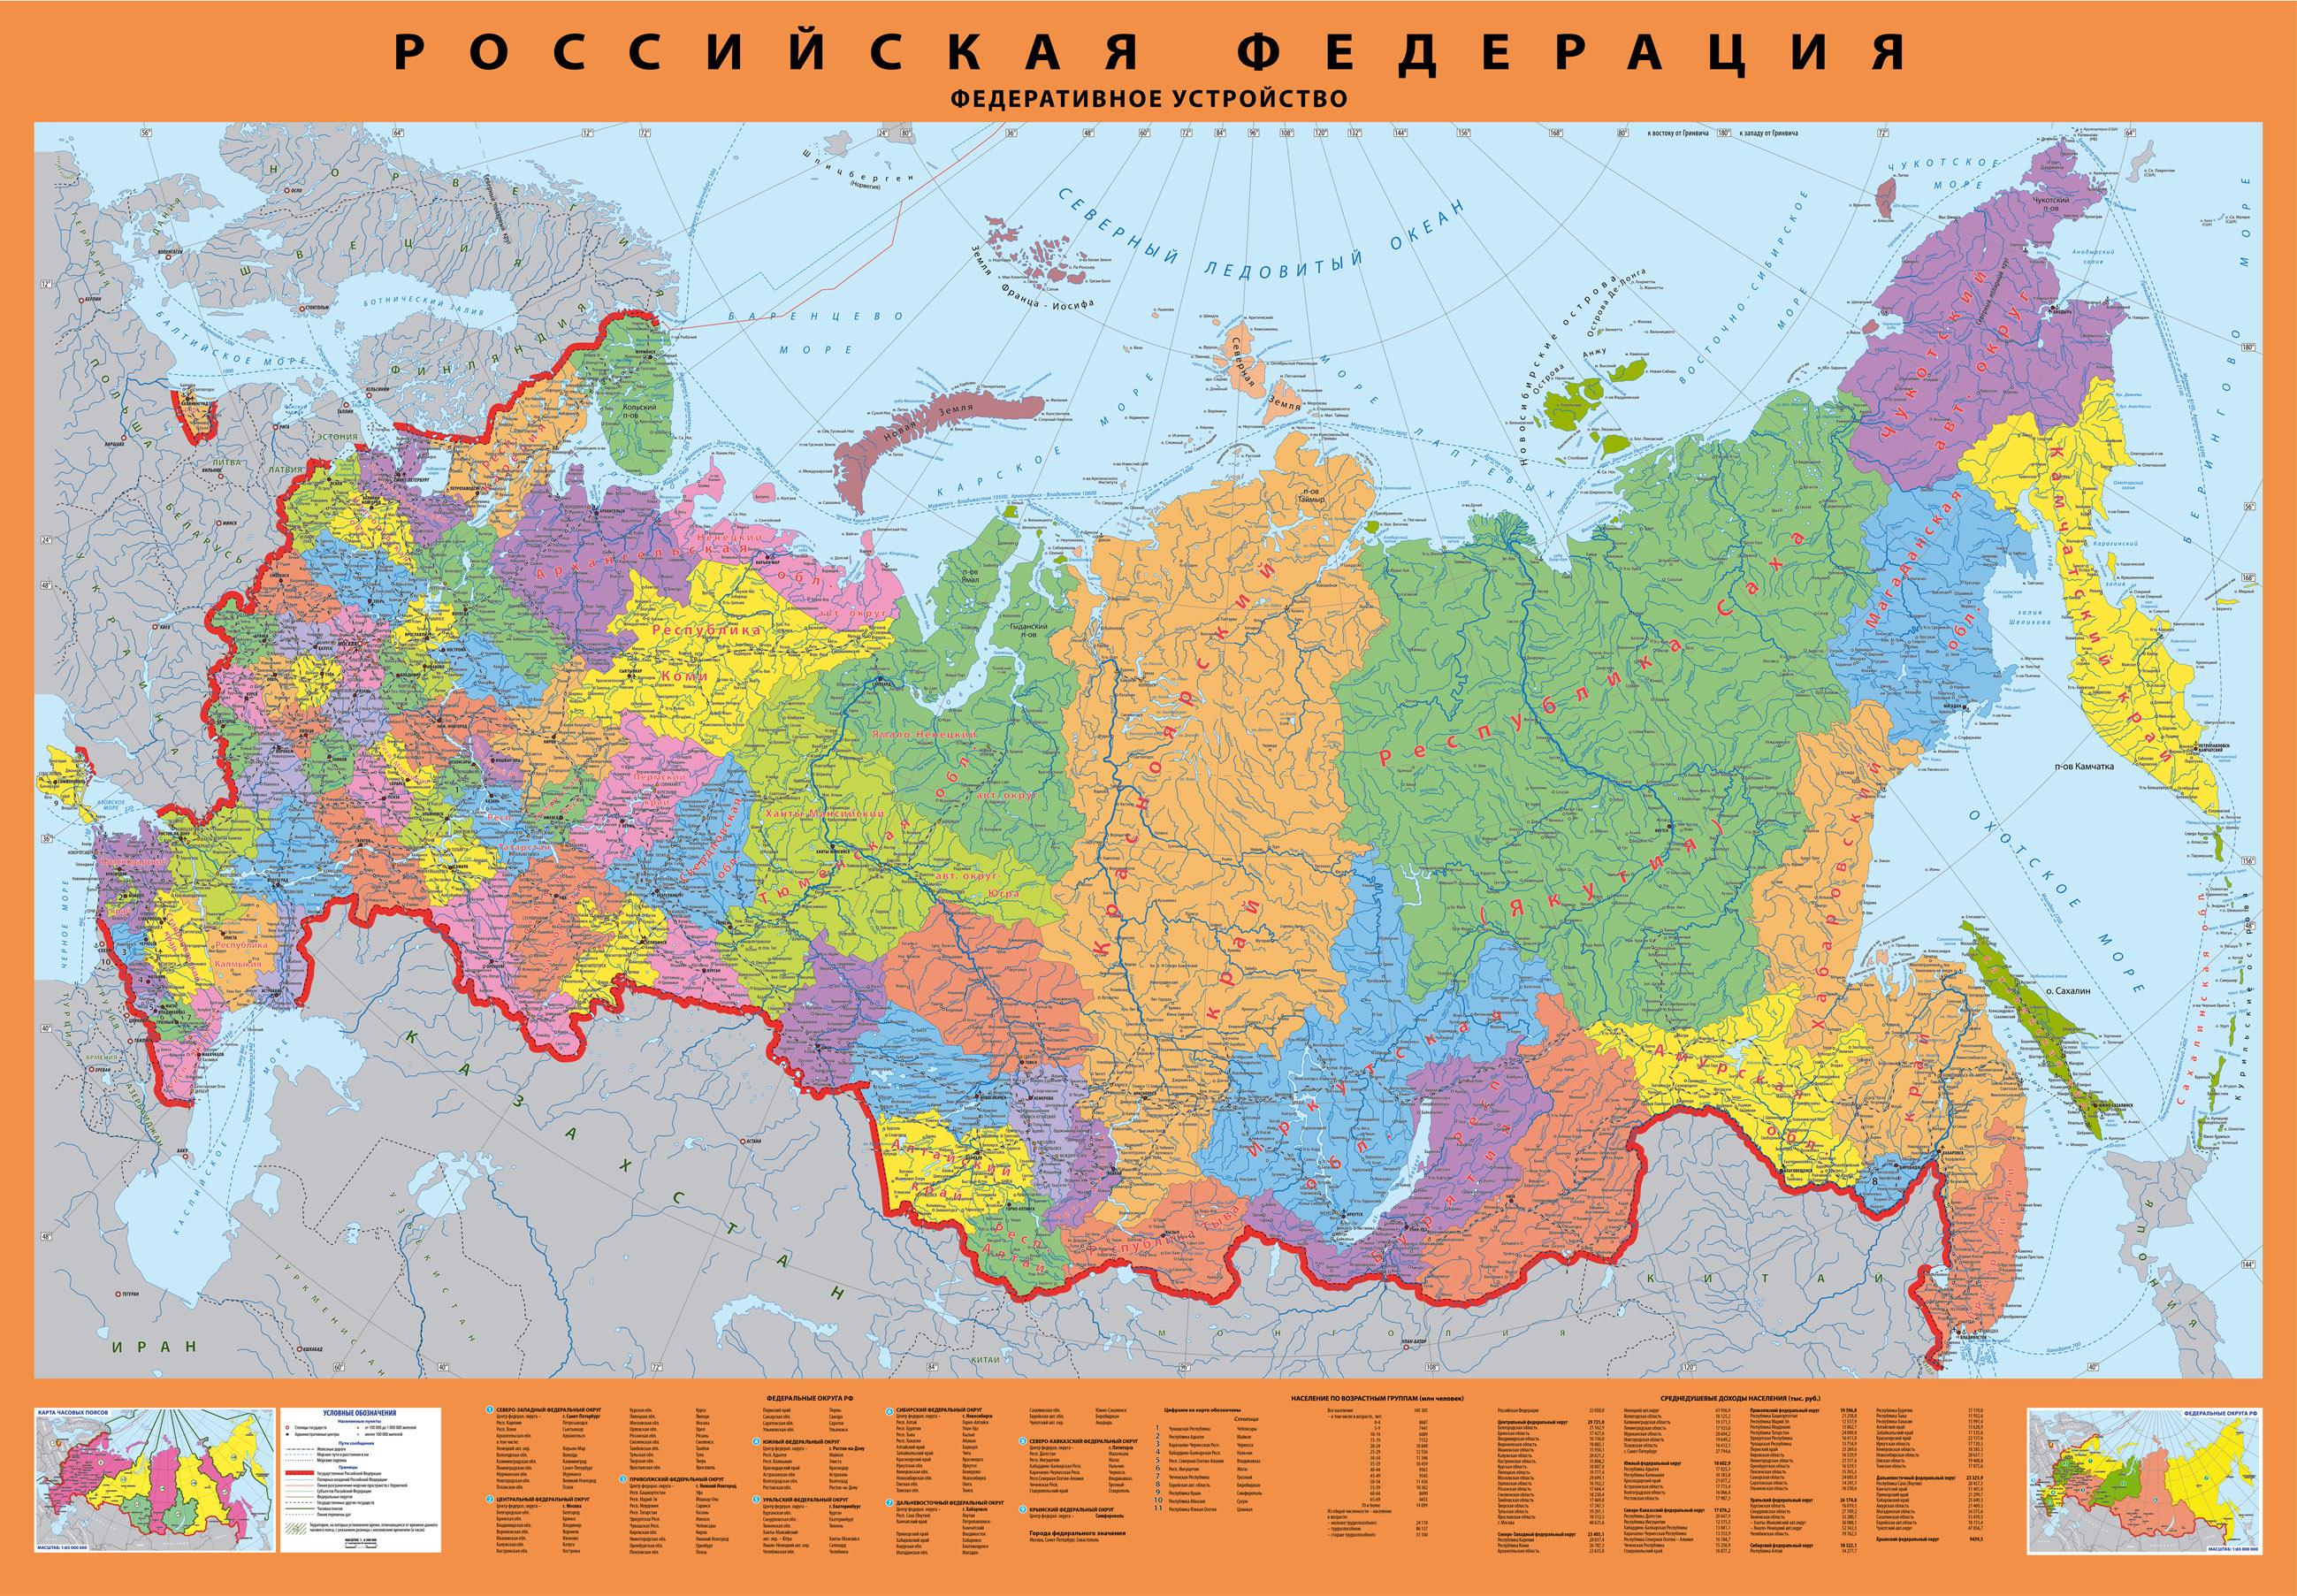 Карта России с городами 2017 года: http://www.traveler-mir.com/country/russia/karty/karta-rossii-s-gorodami-2017